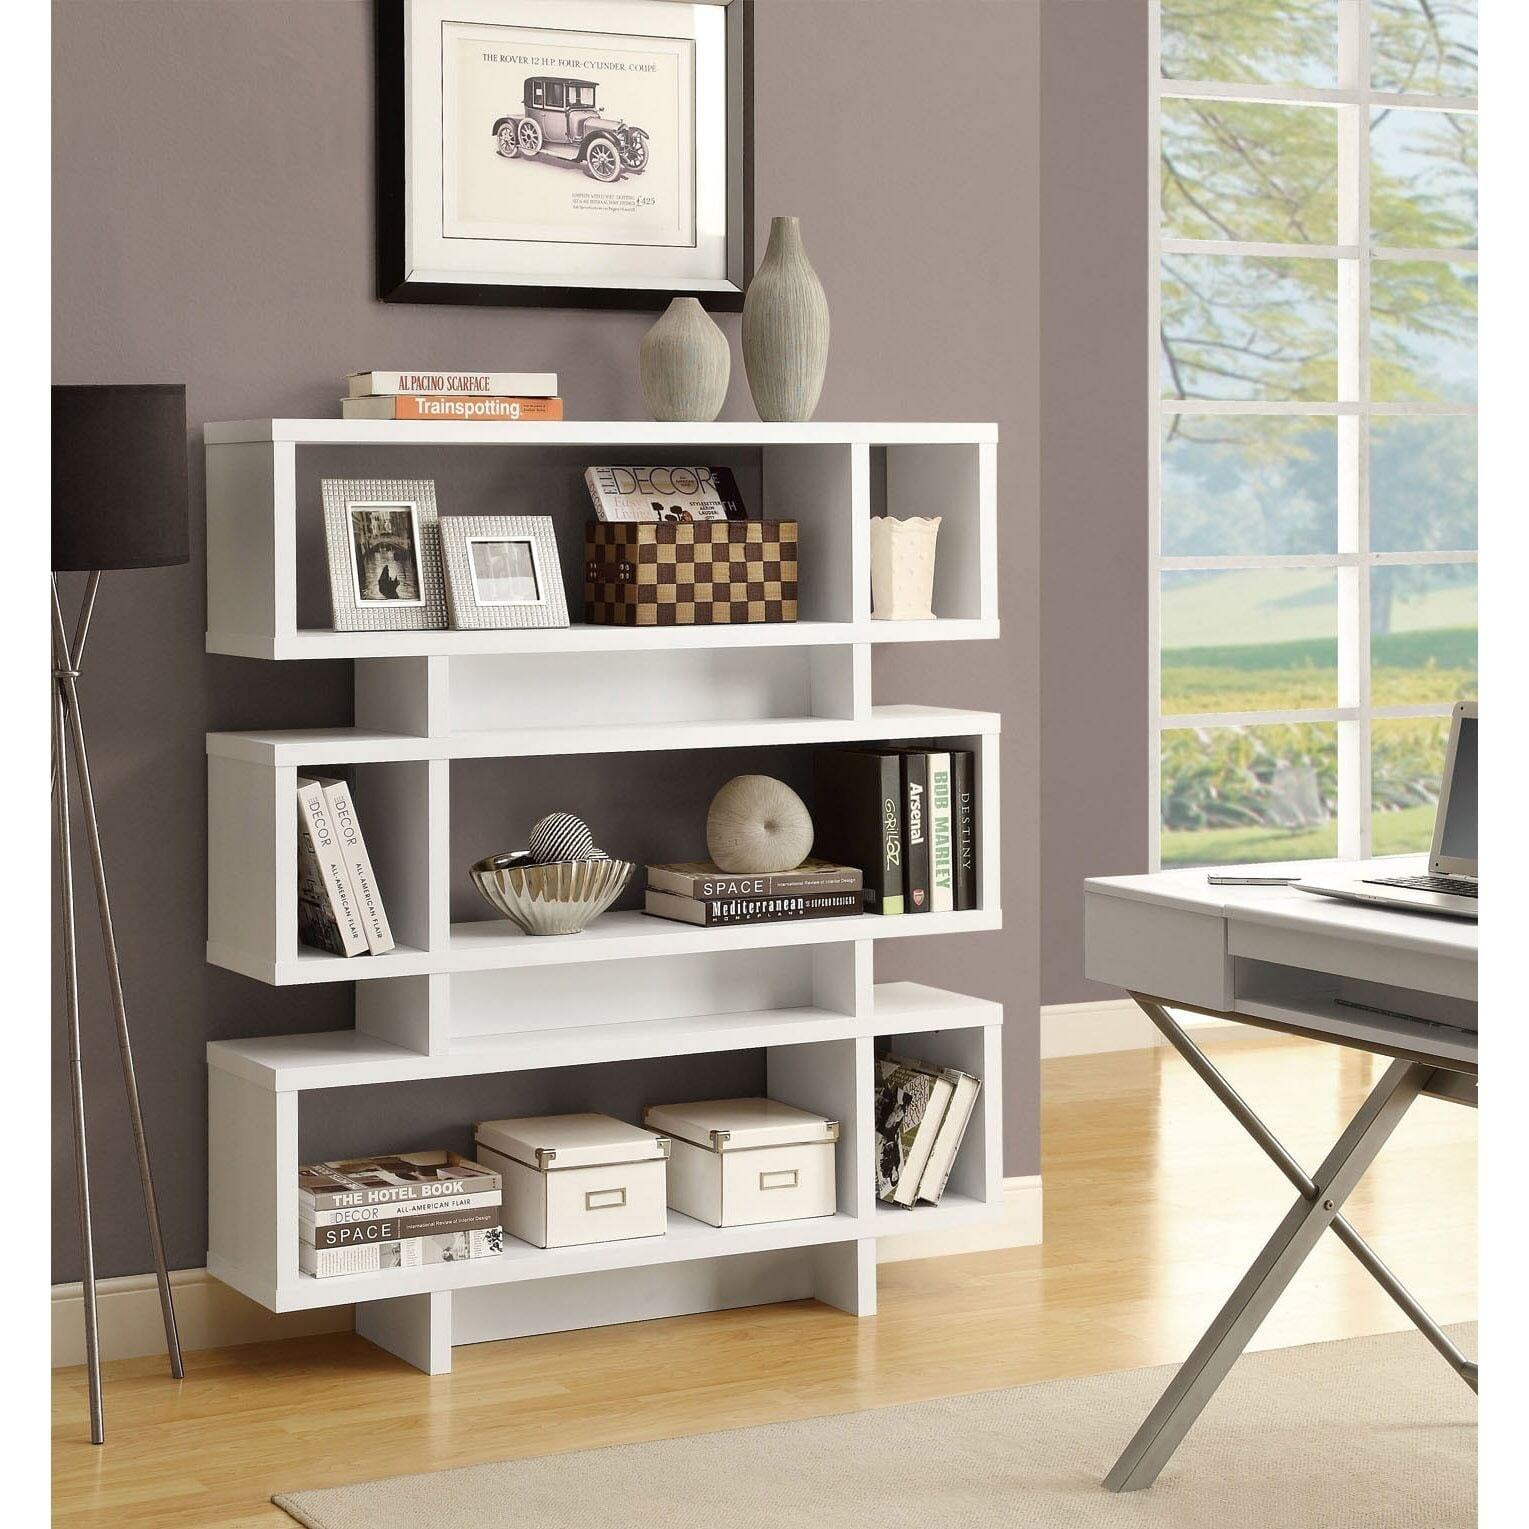 White 55 inch High Modern Bookcase